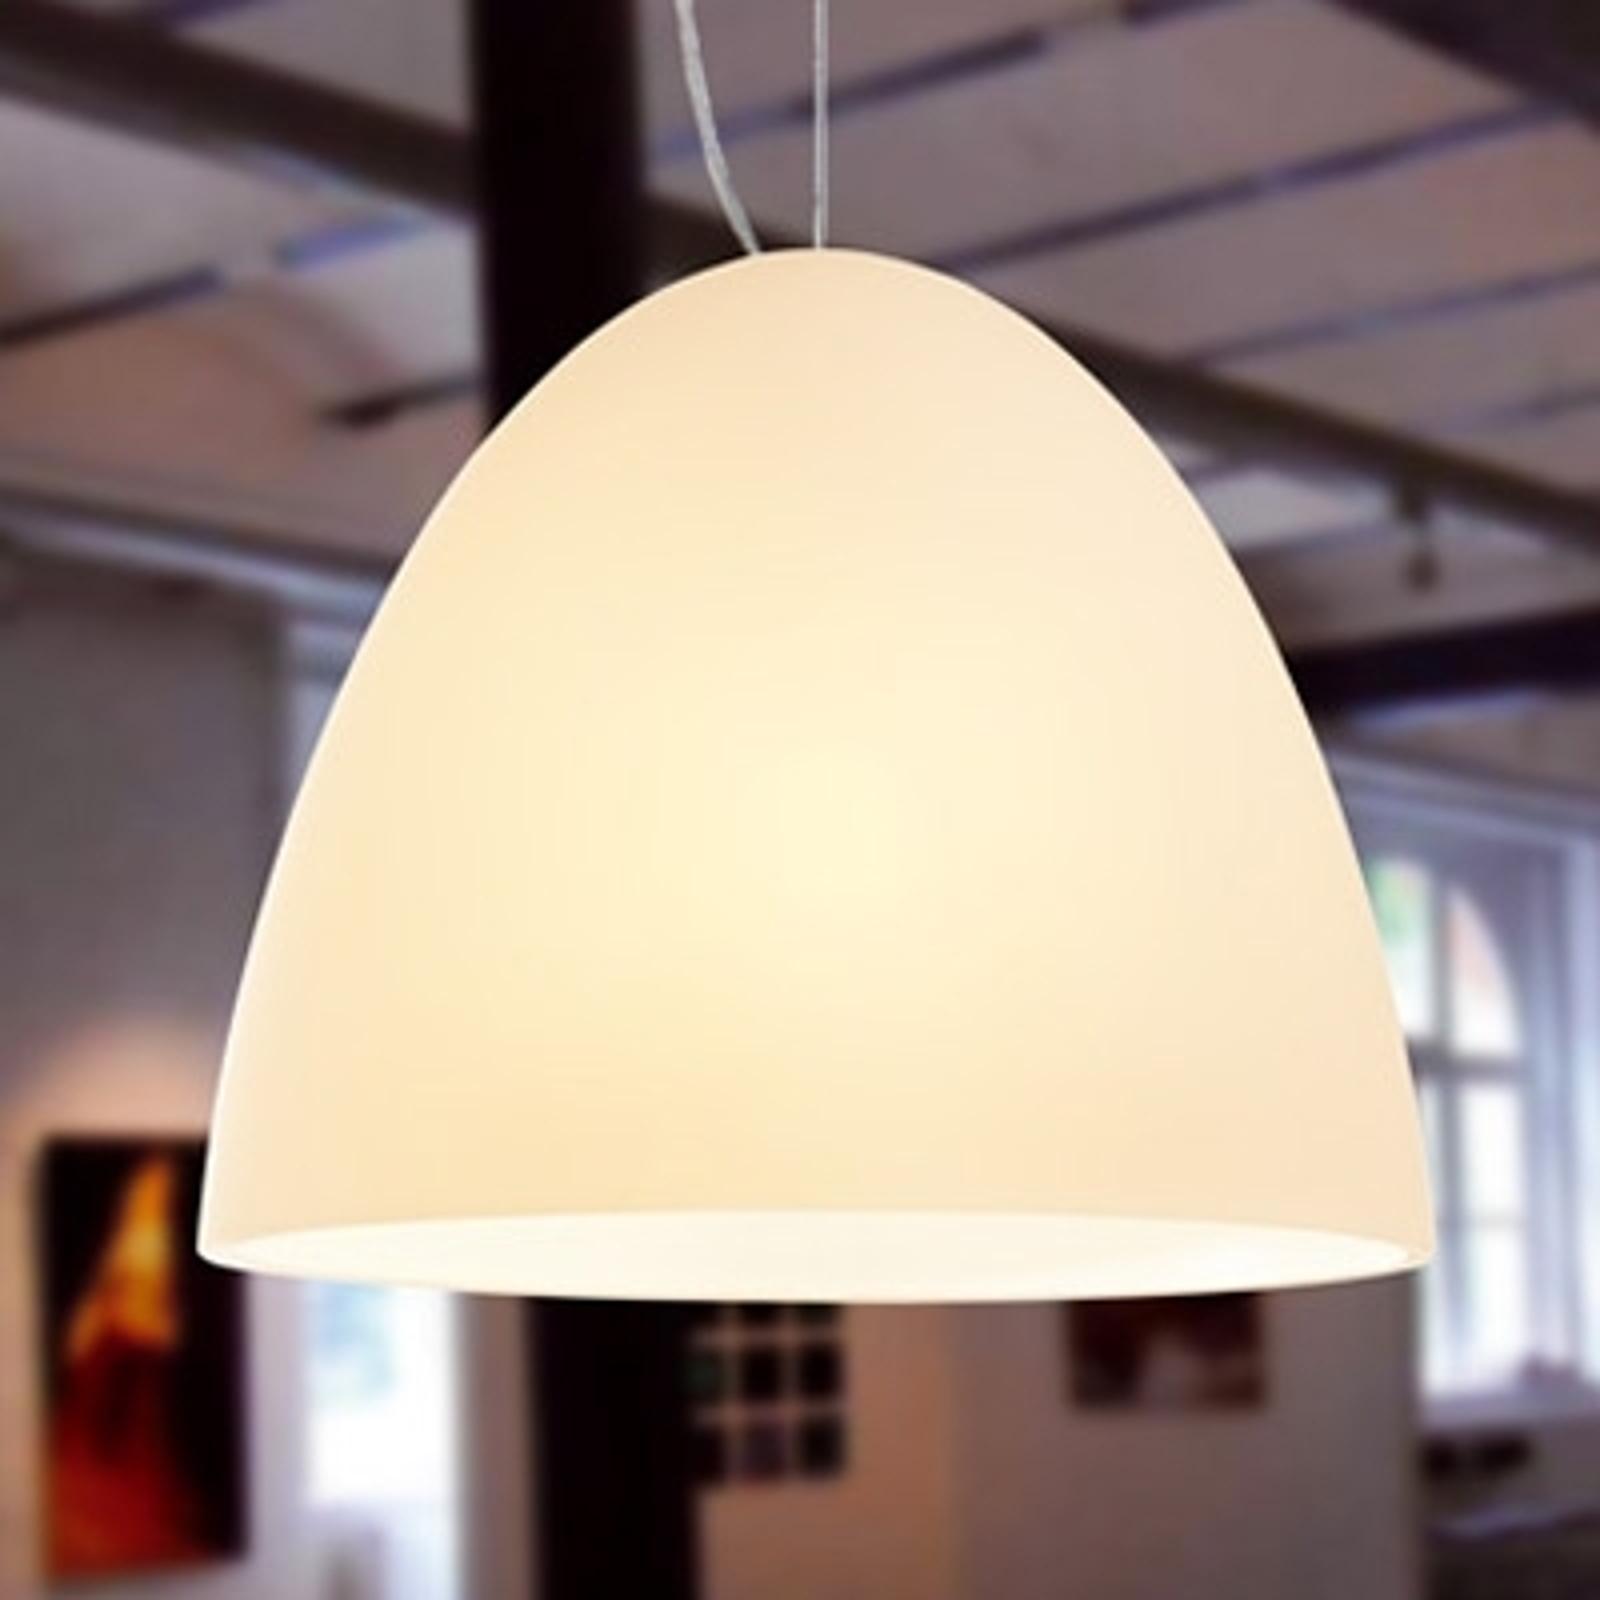 BELL 1-punktowa lampa wisząca piaskowa 21 cm